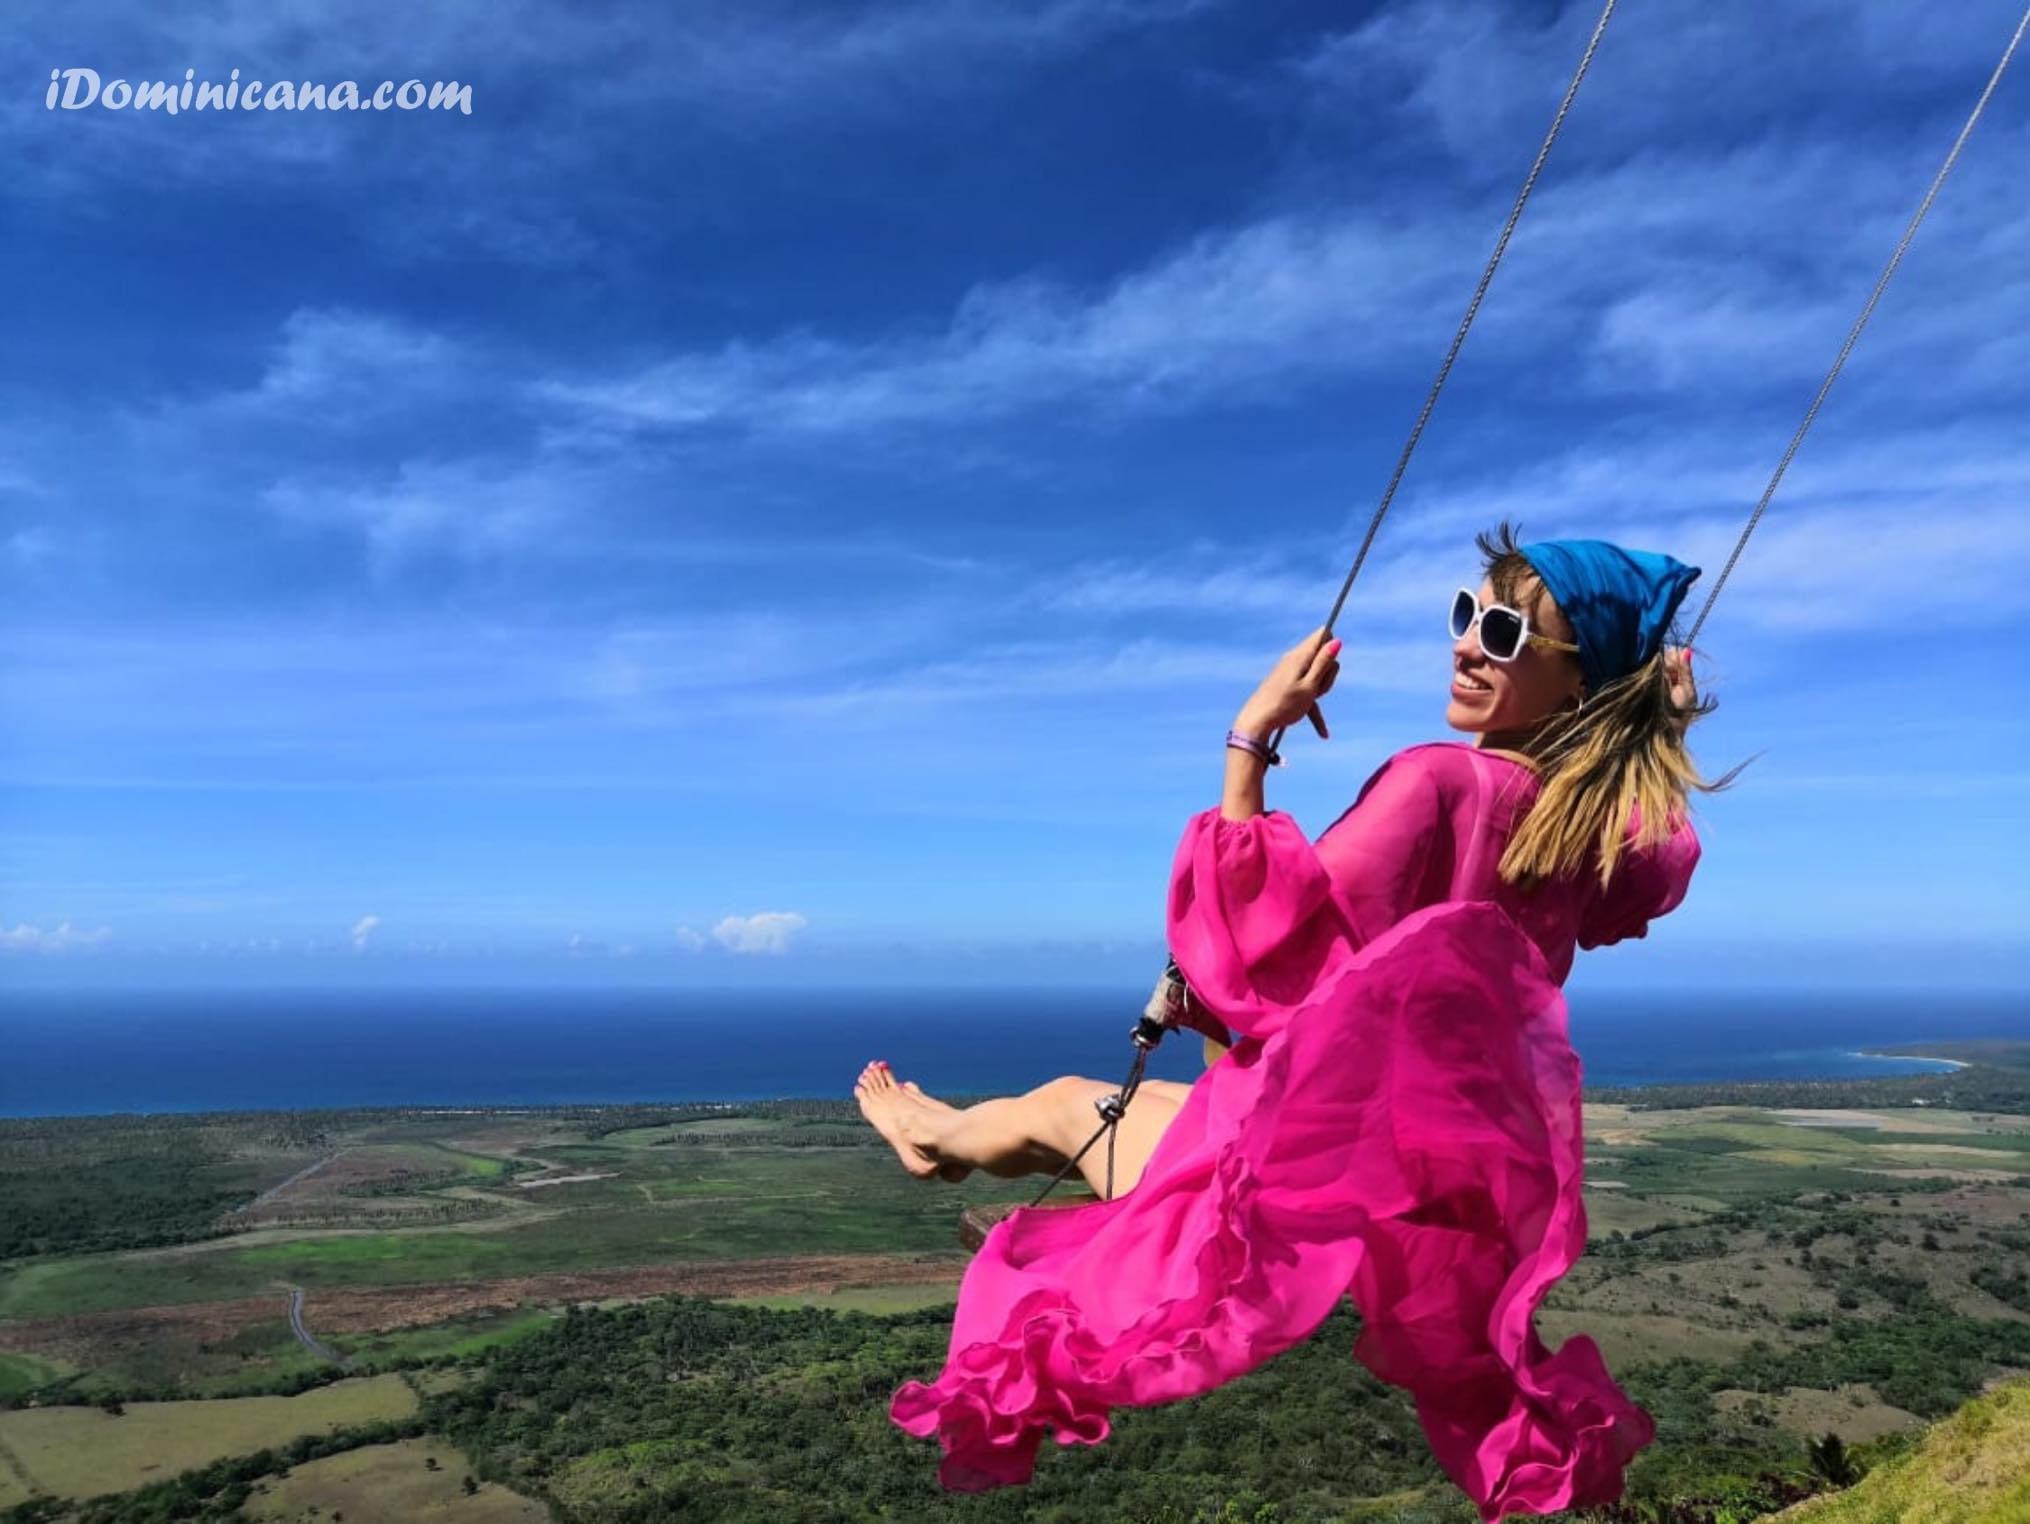 Сафари Доминикана + гора Редонда - фото наших туристов